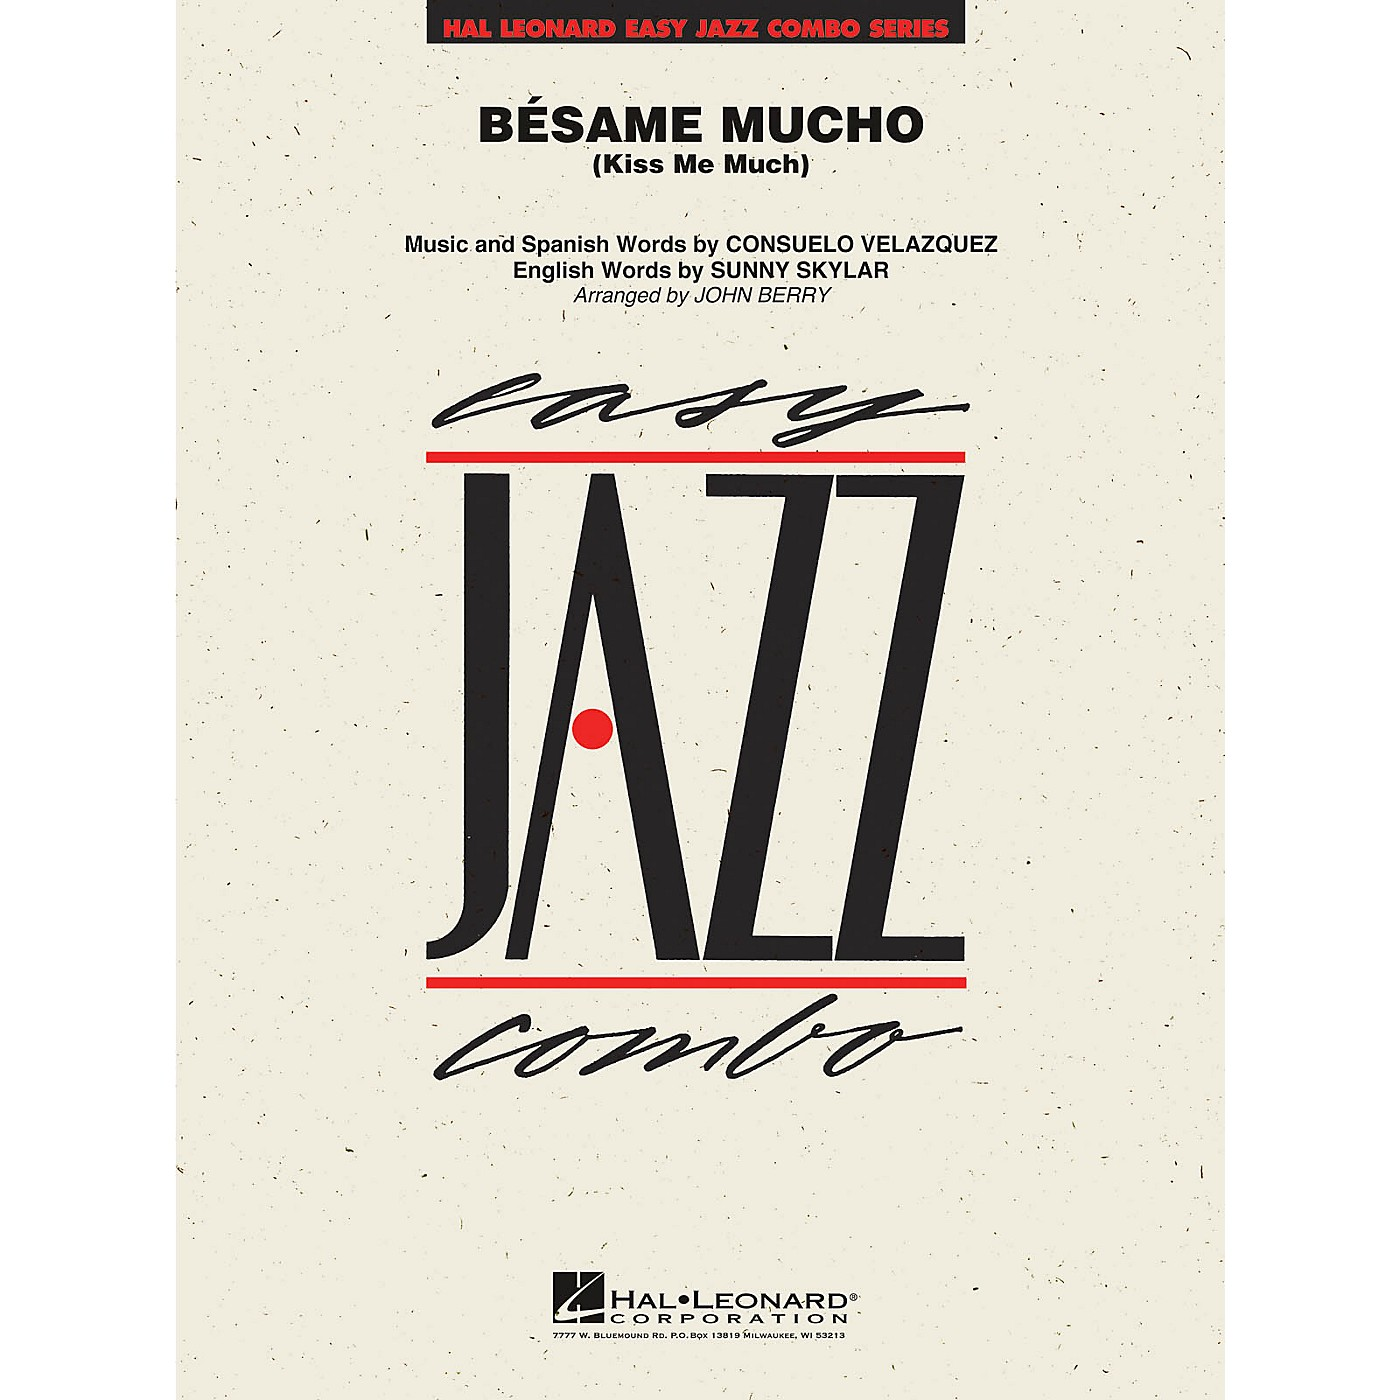 Hal Leonard Bésame Mucho (Kiss Me Much) Jazz Band Level 2 Arranged by John Berry thumbnail